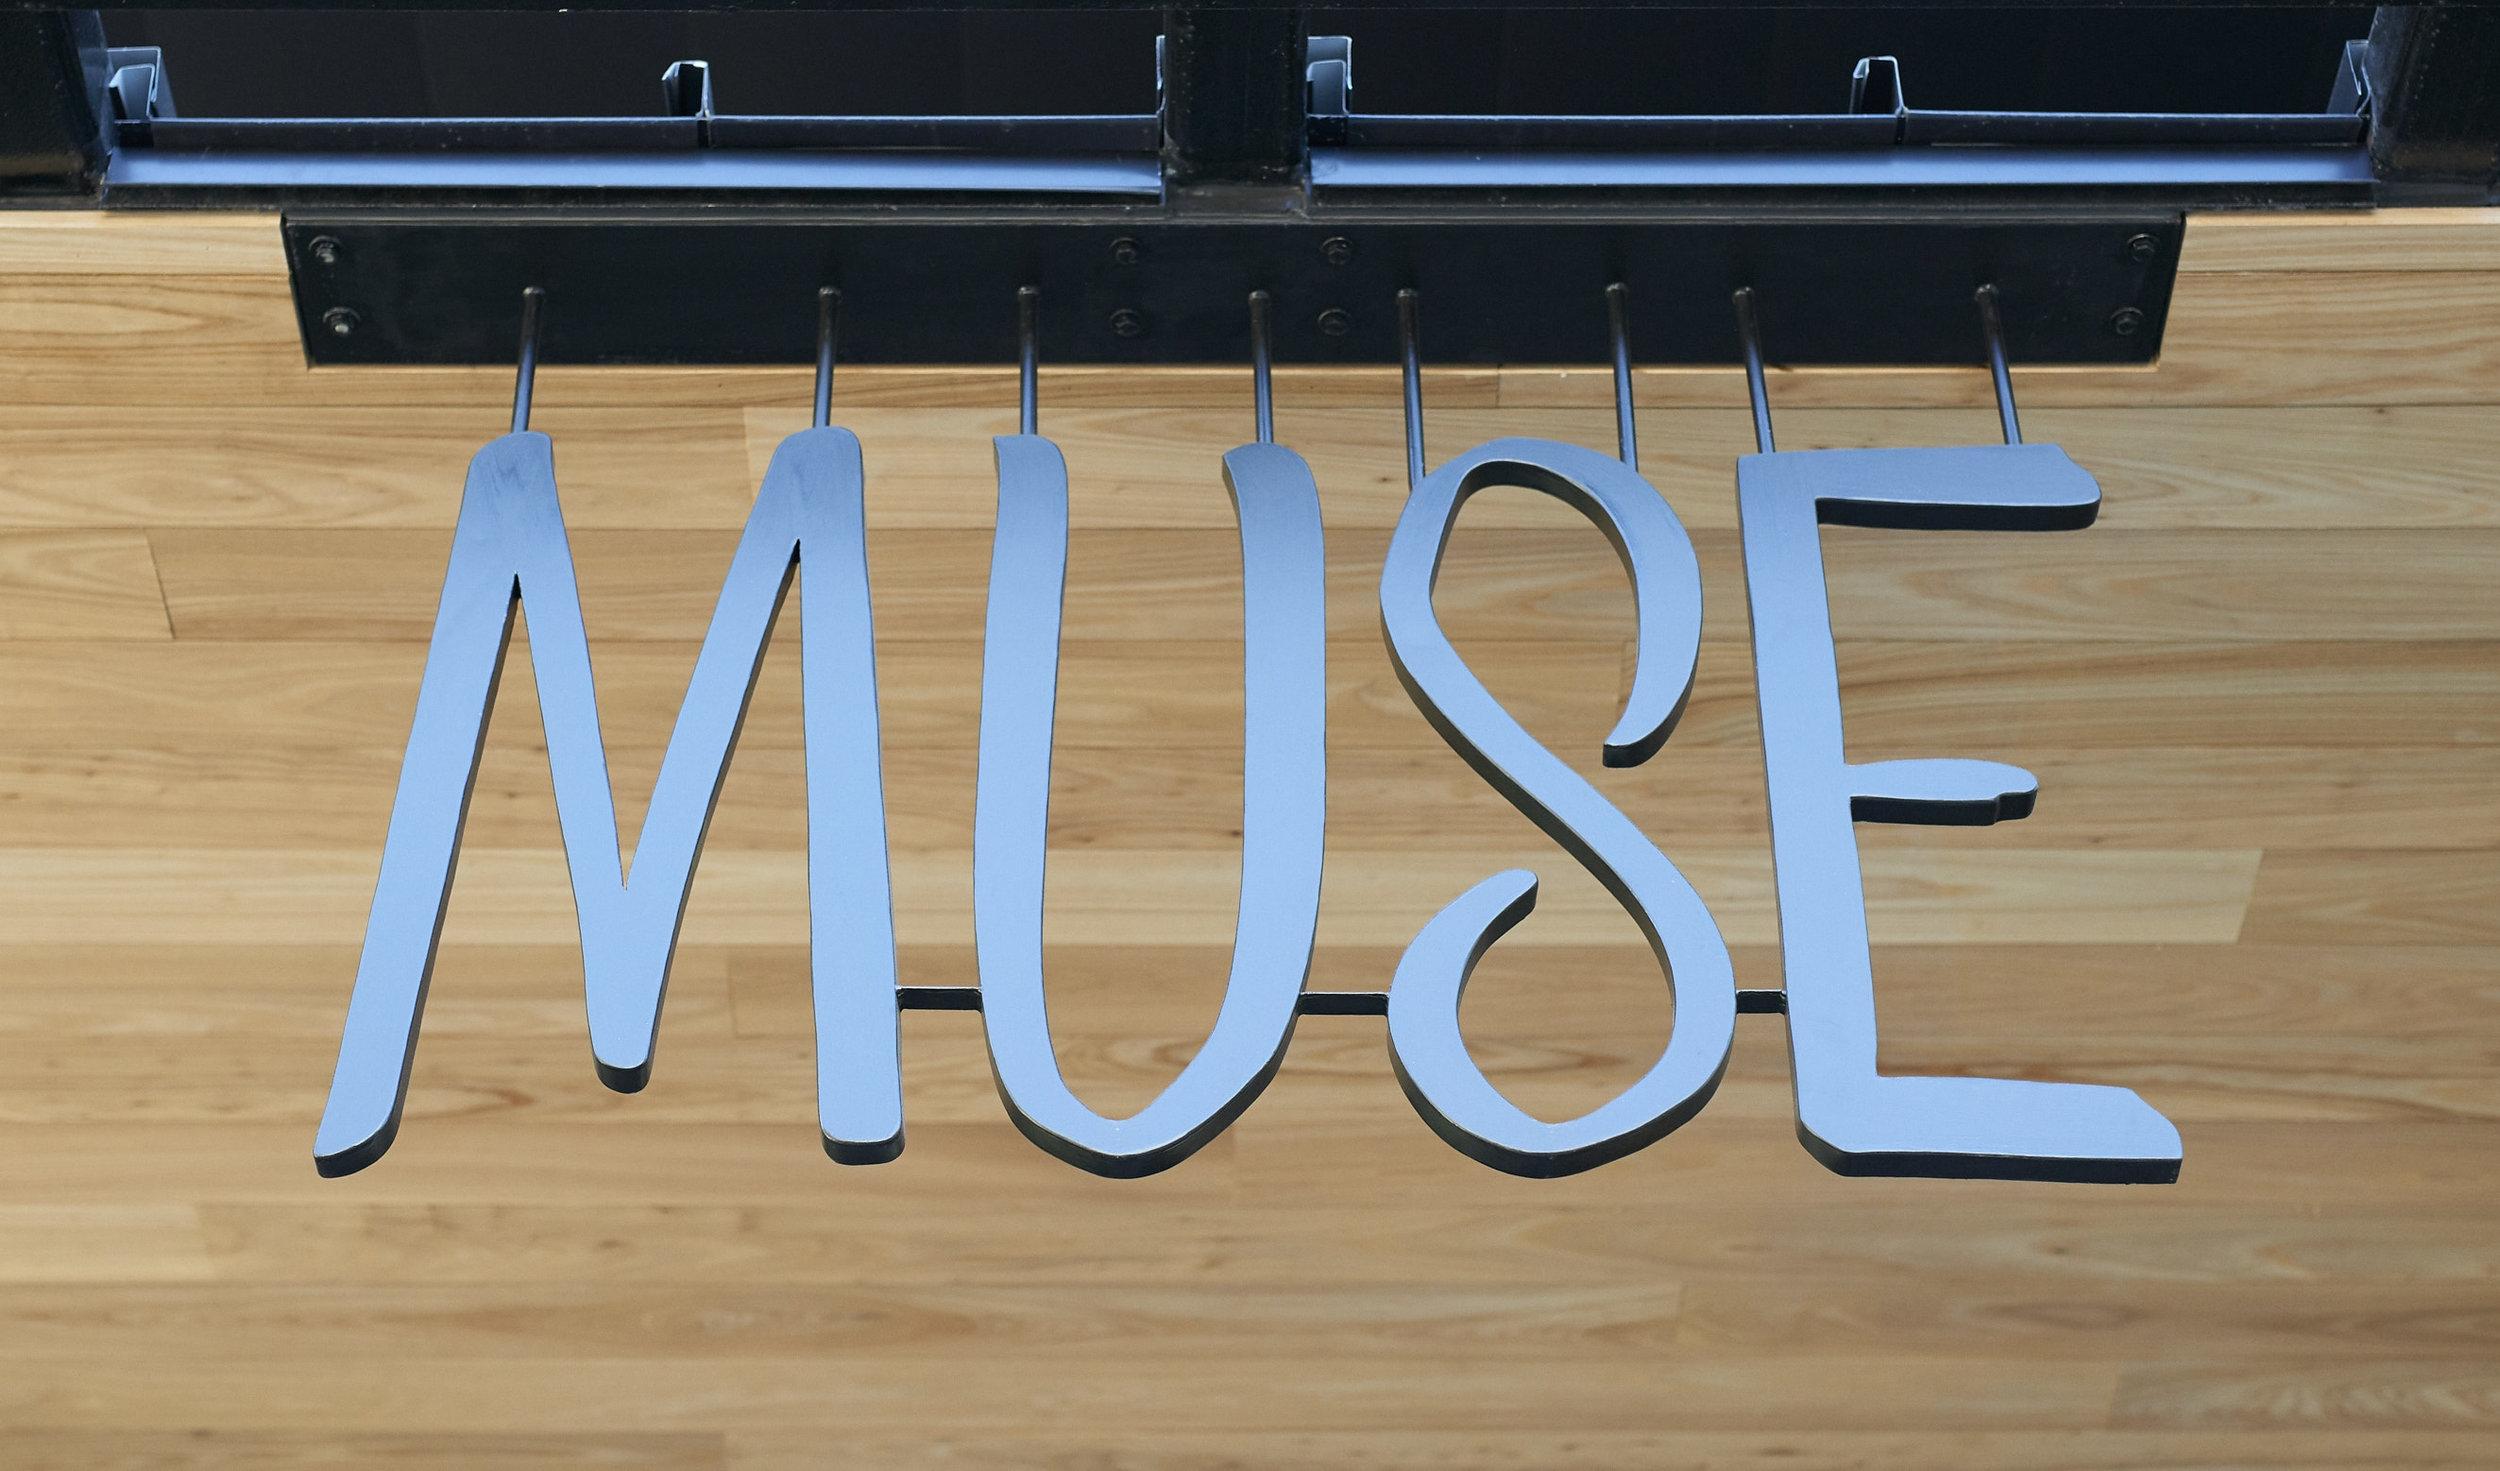 muse sign 1.jpg